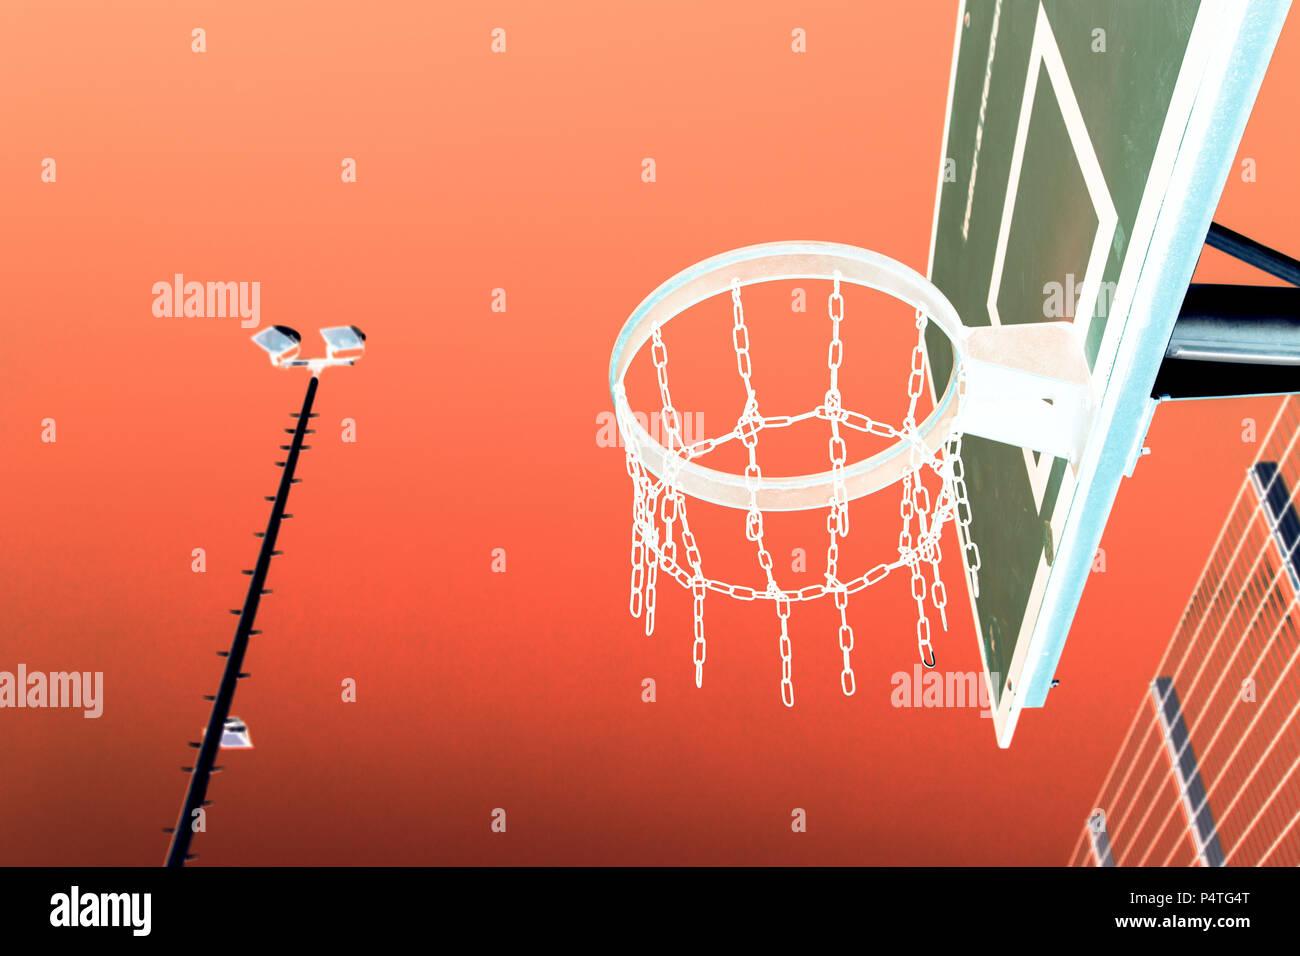 Basketball, Streetcoourts, Negative Shot - Stock Image